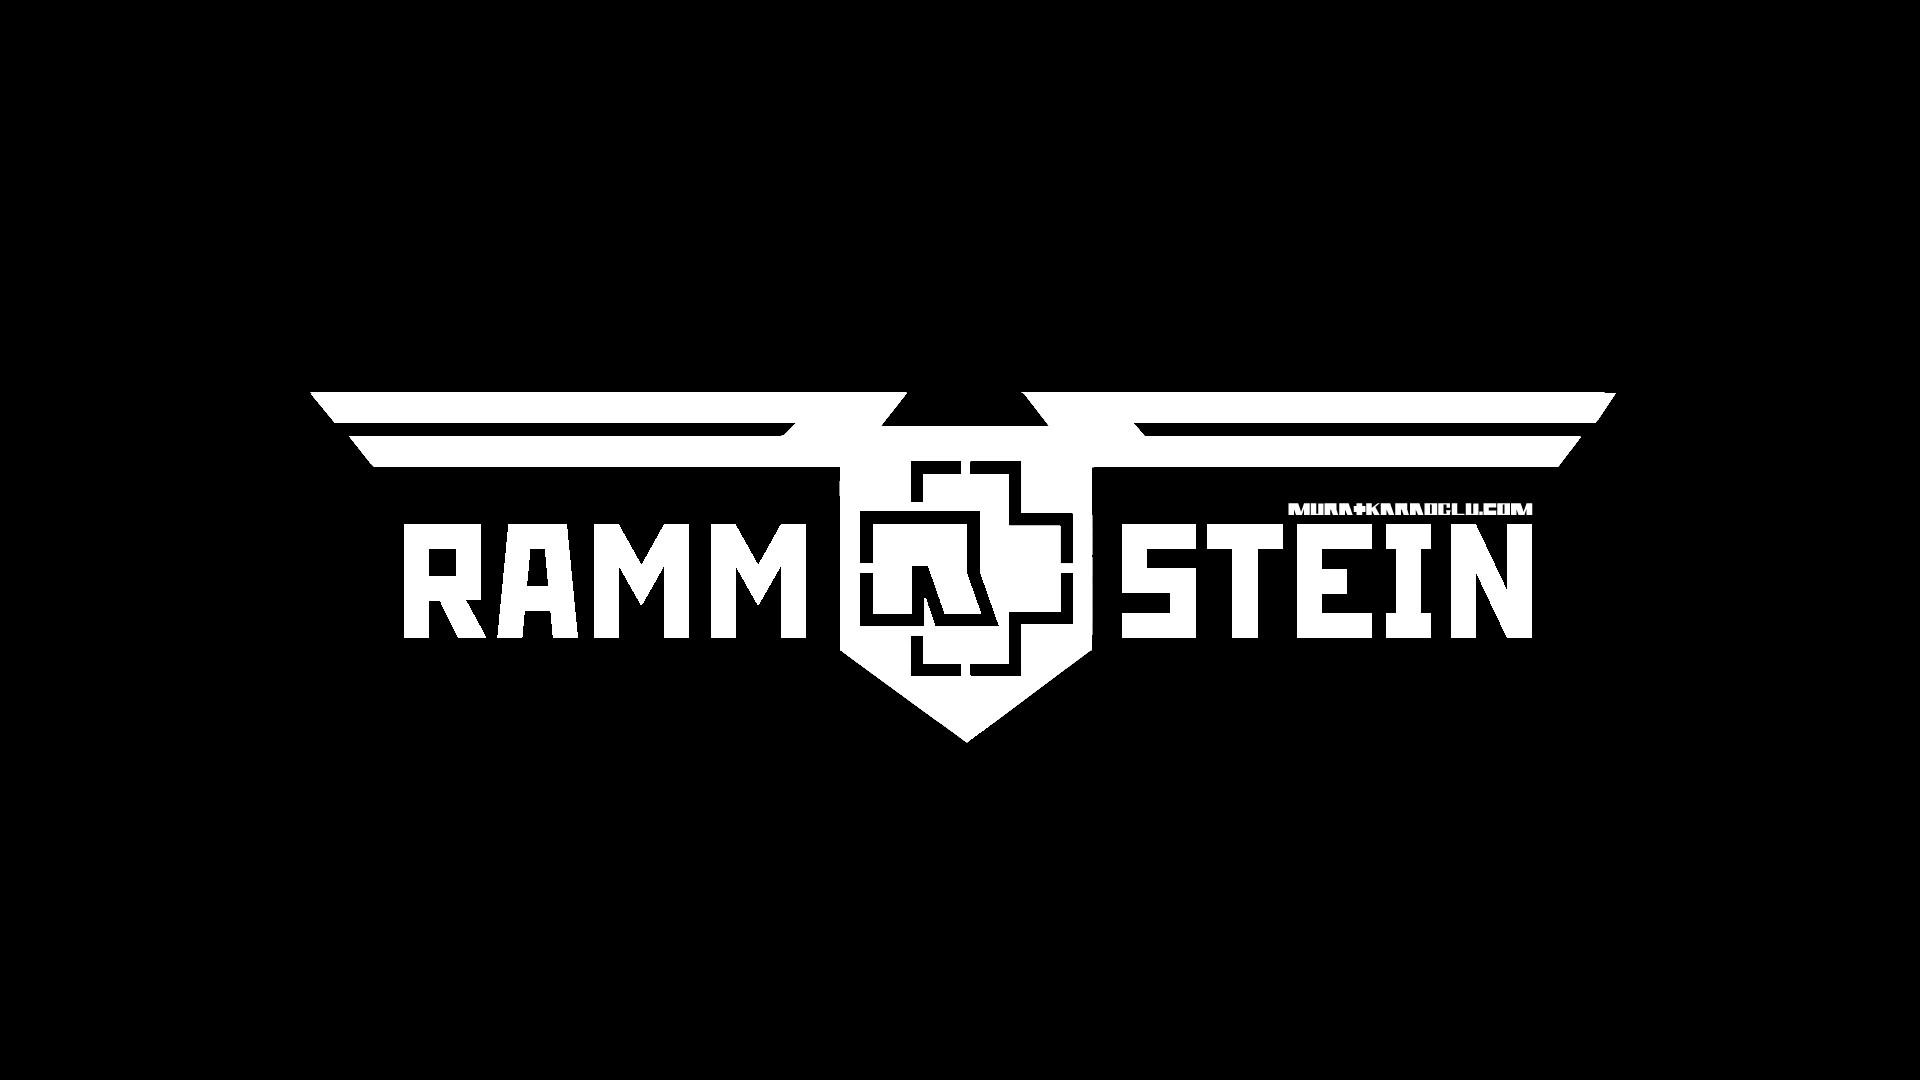 HD Wallpaper   Background ID:144755. Music Rammstein